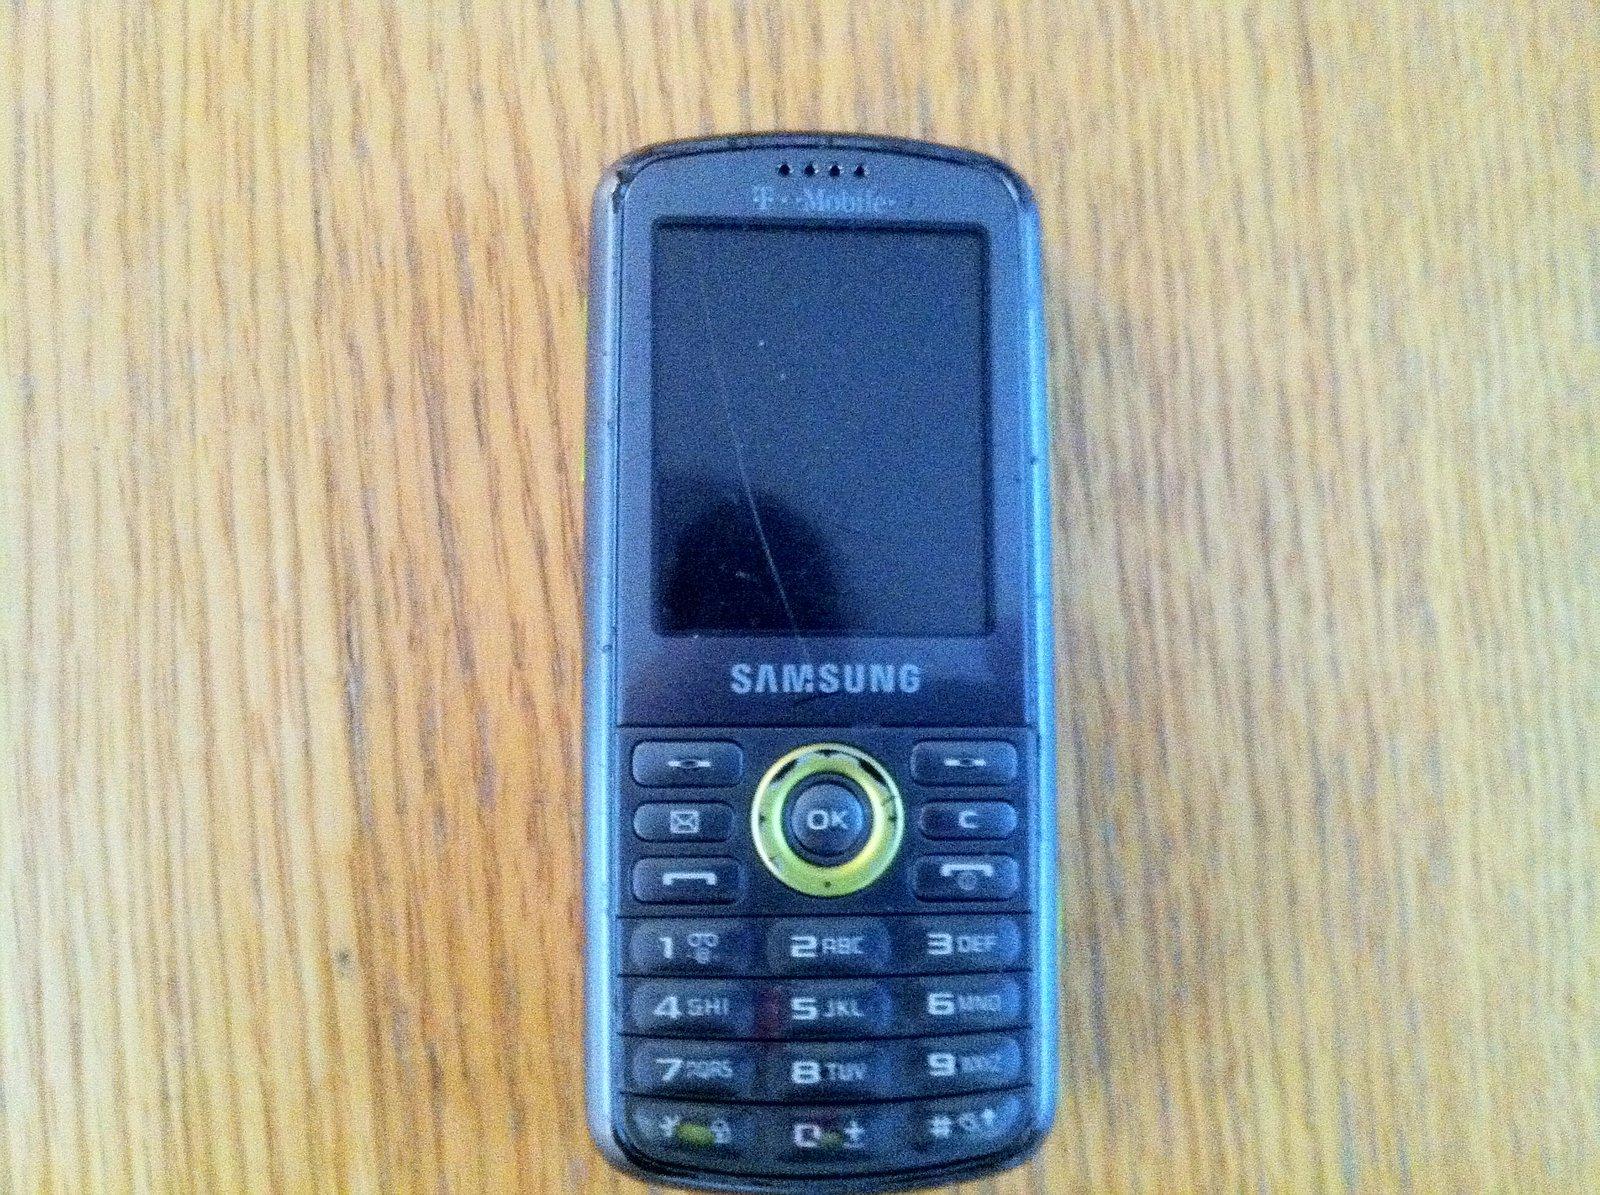 Samsung gravity 1